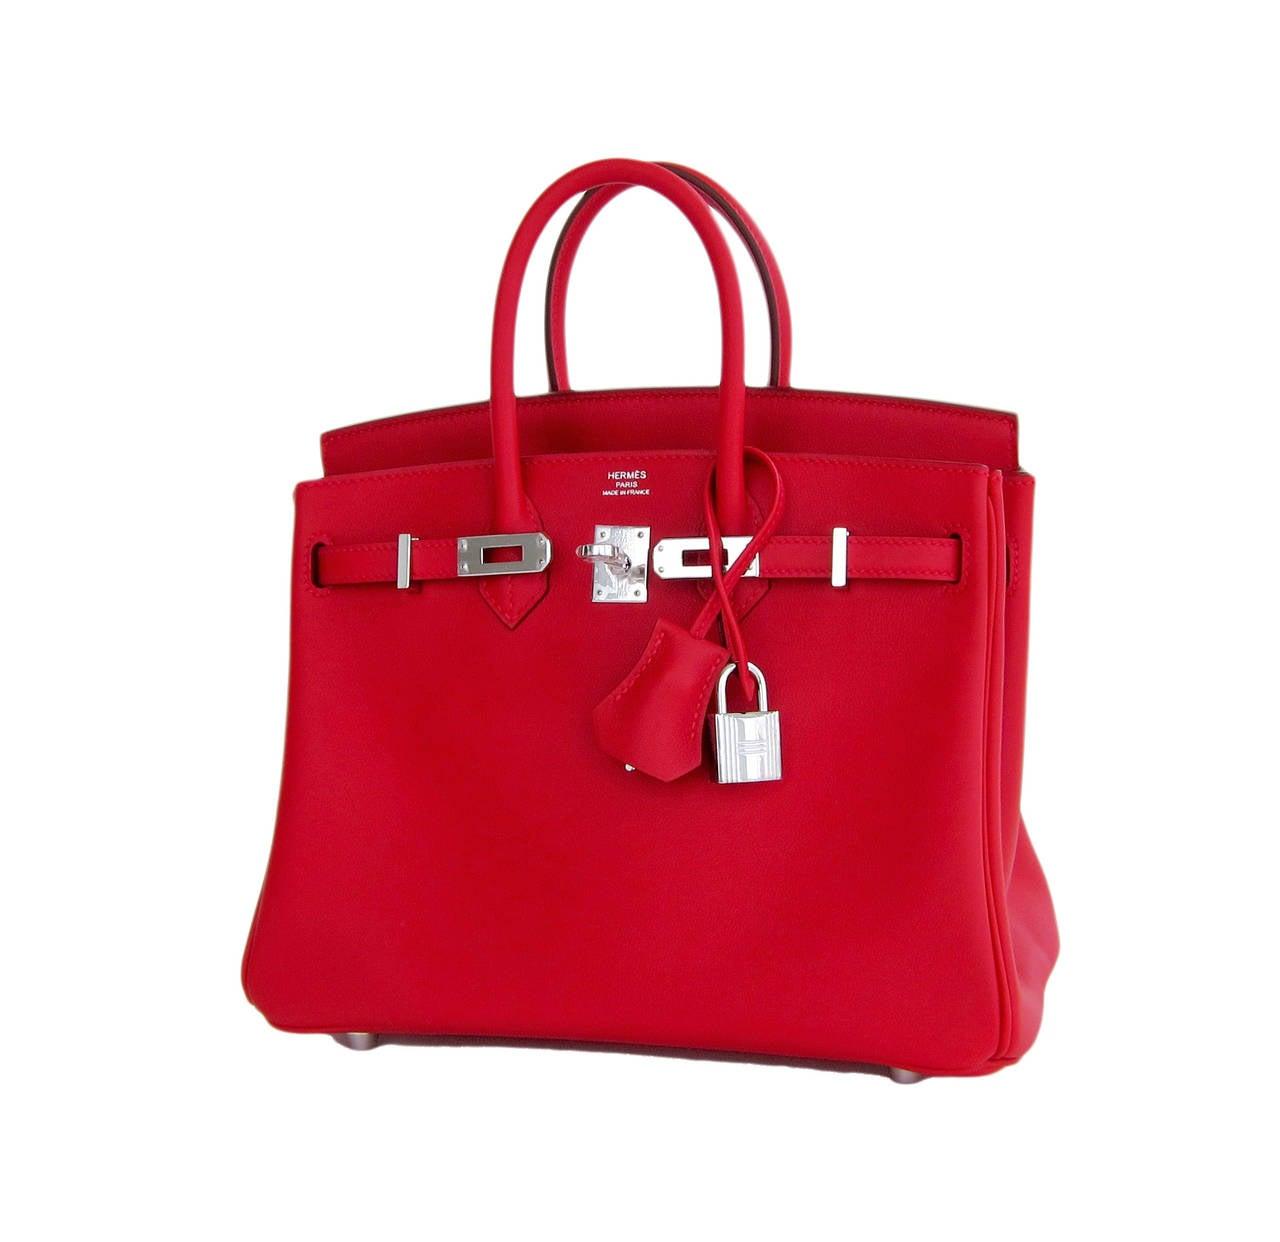 hermes satchel bag